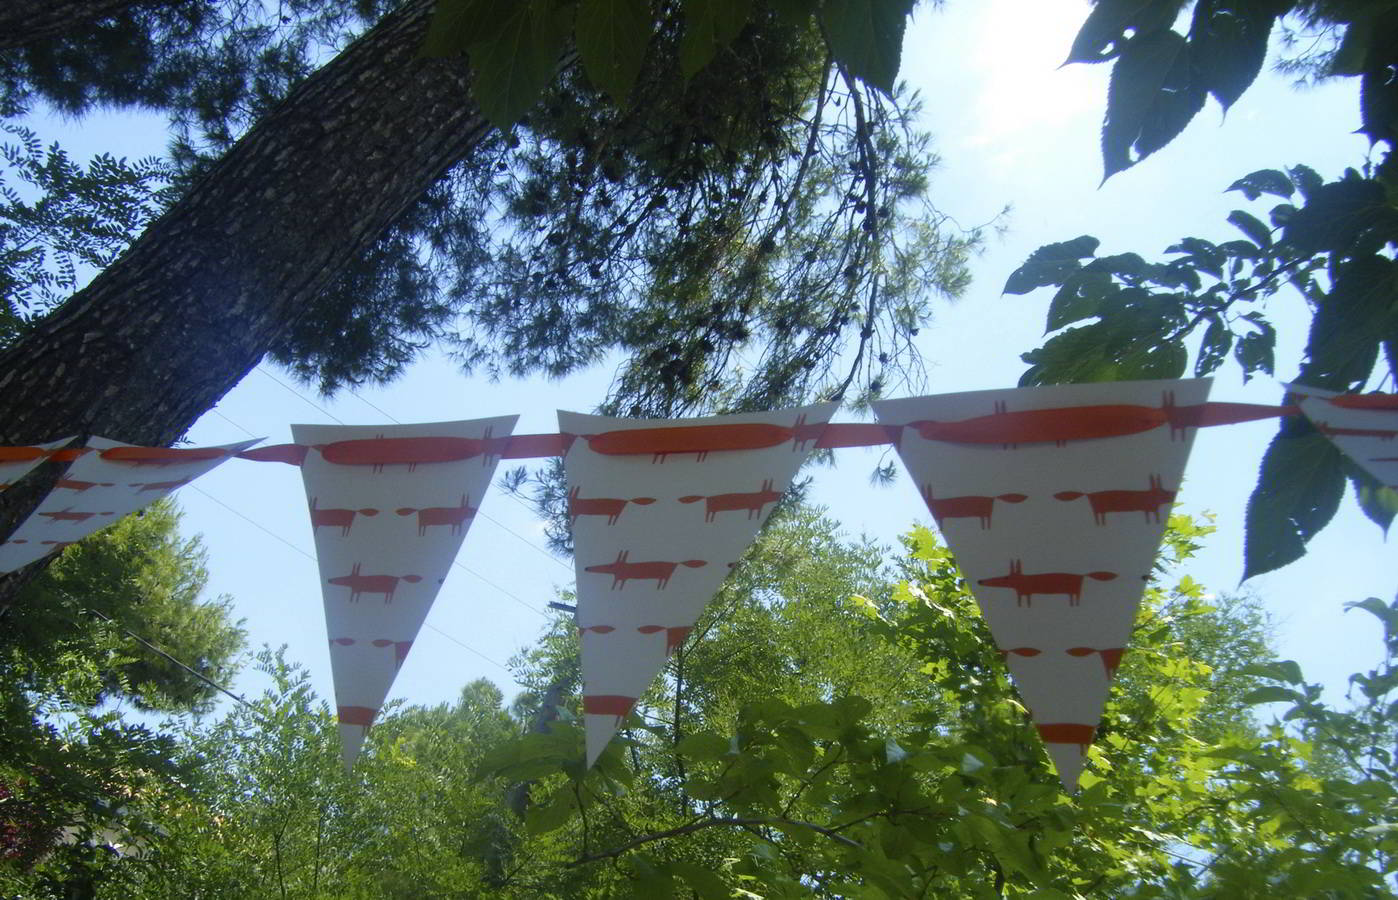 baptism_the-orange-fox_hara-kontaxaki_19